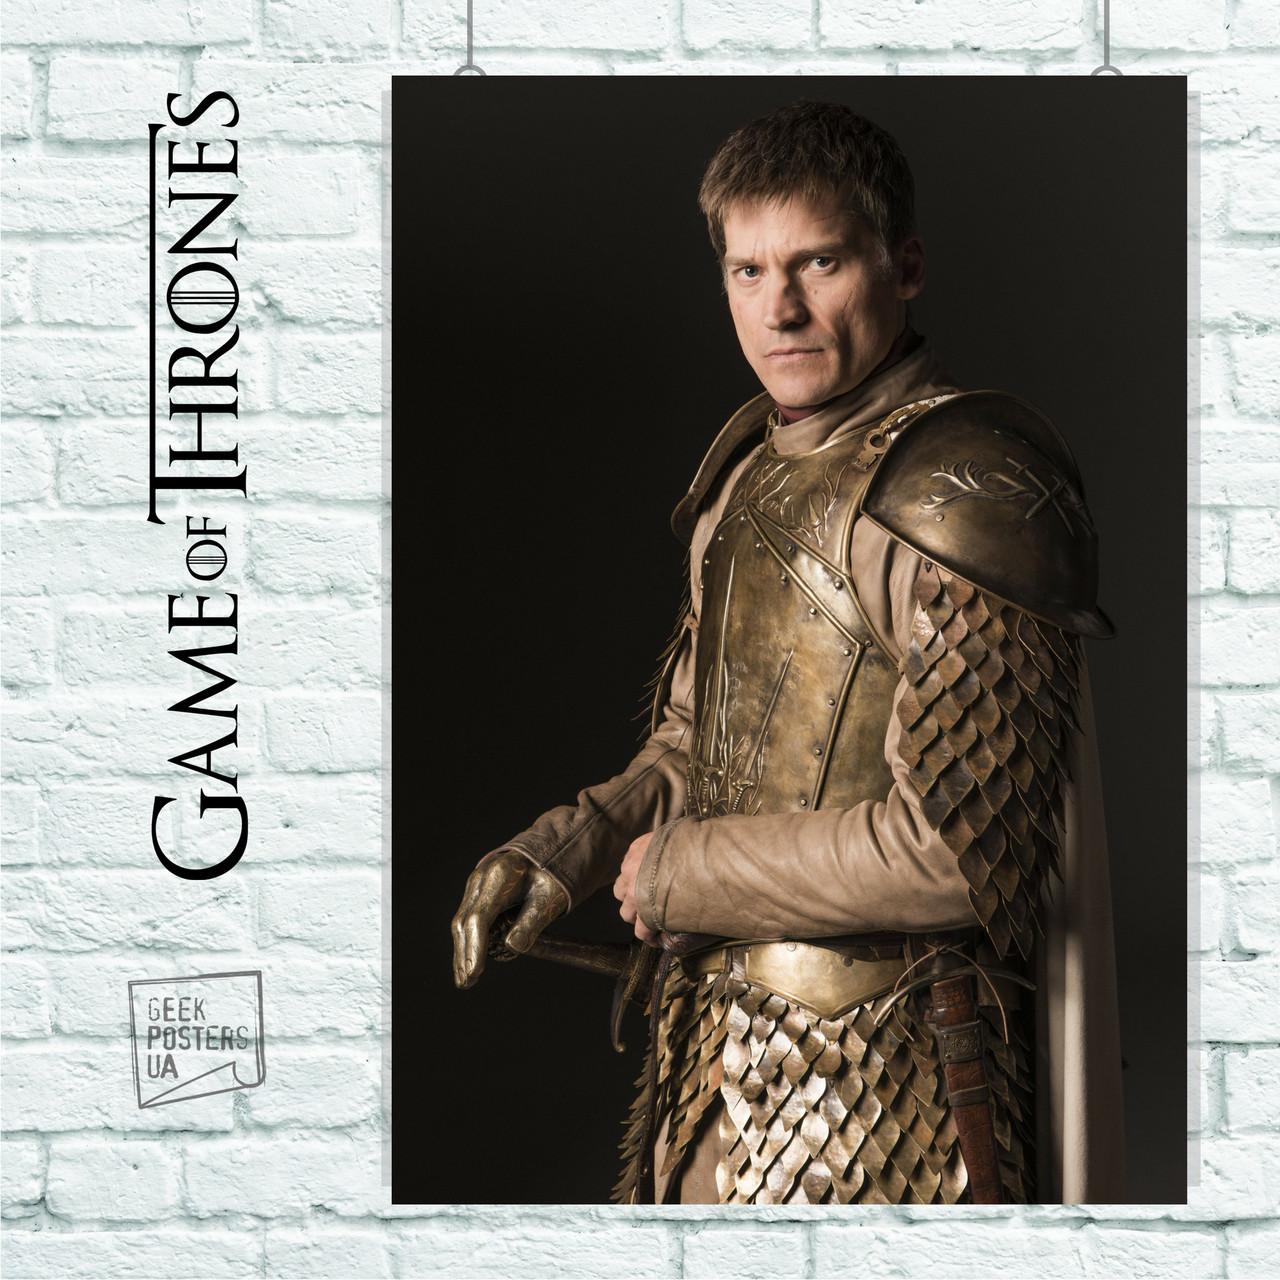 Постер Джейме Ланнистер, Jaime Lannister, Игра Престолов. Размер 60x42см (A2). Глянцевая бумага